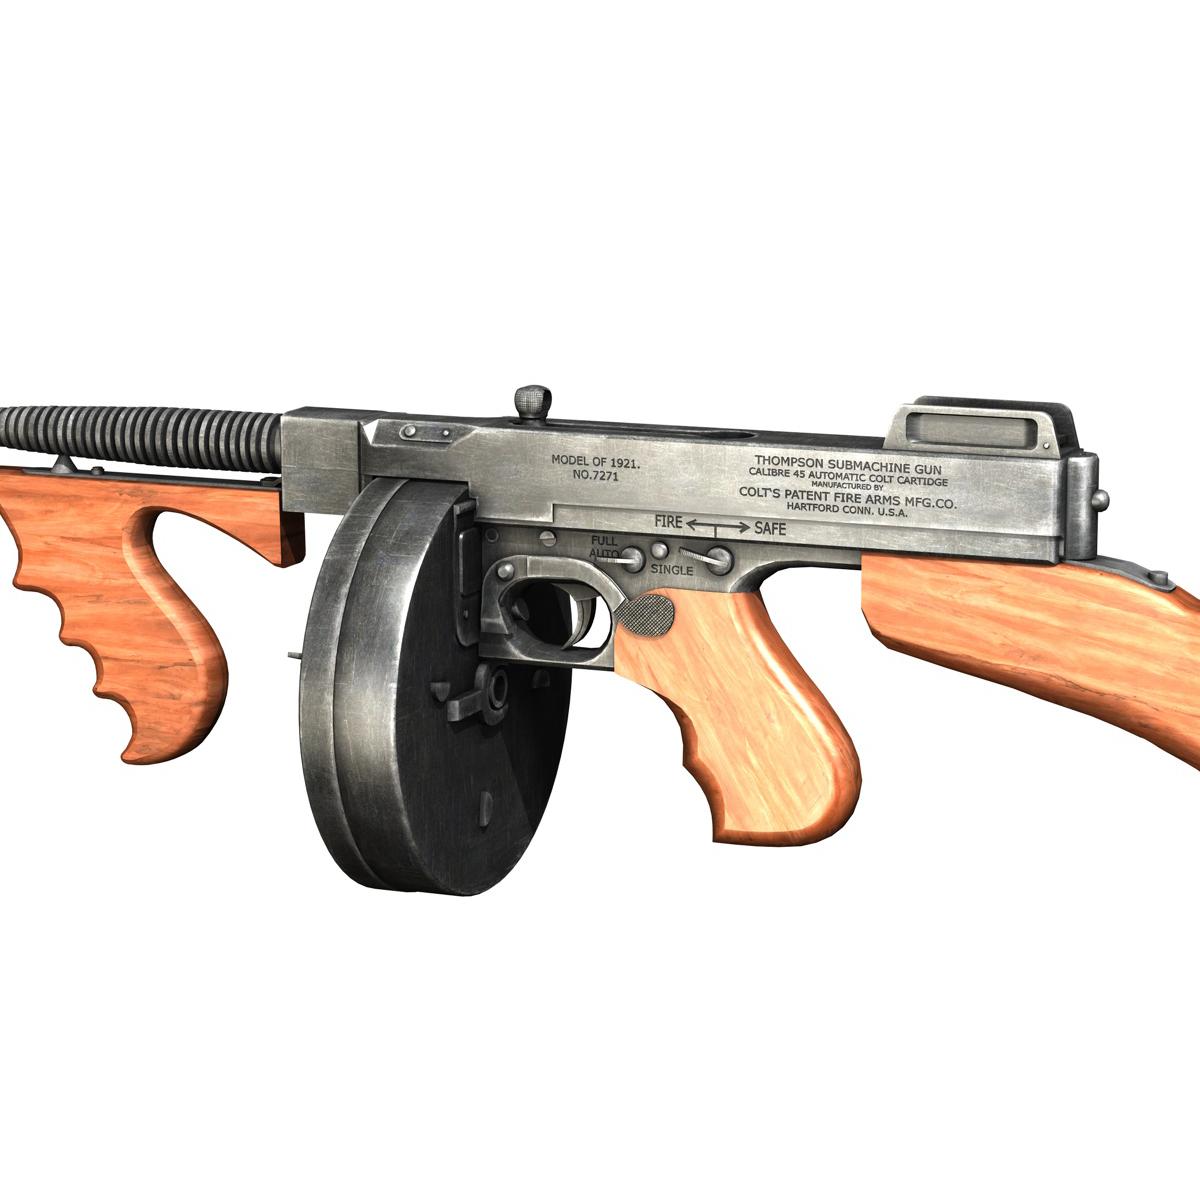 colt model1921 thompson submachine gun 3d model 3ds c4d lwo obj 264713